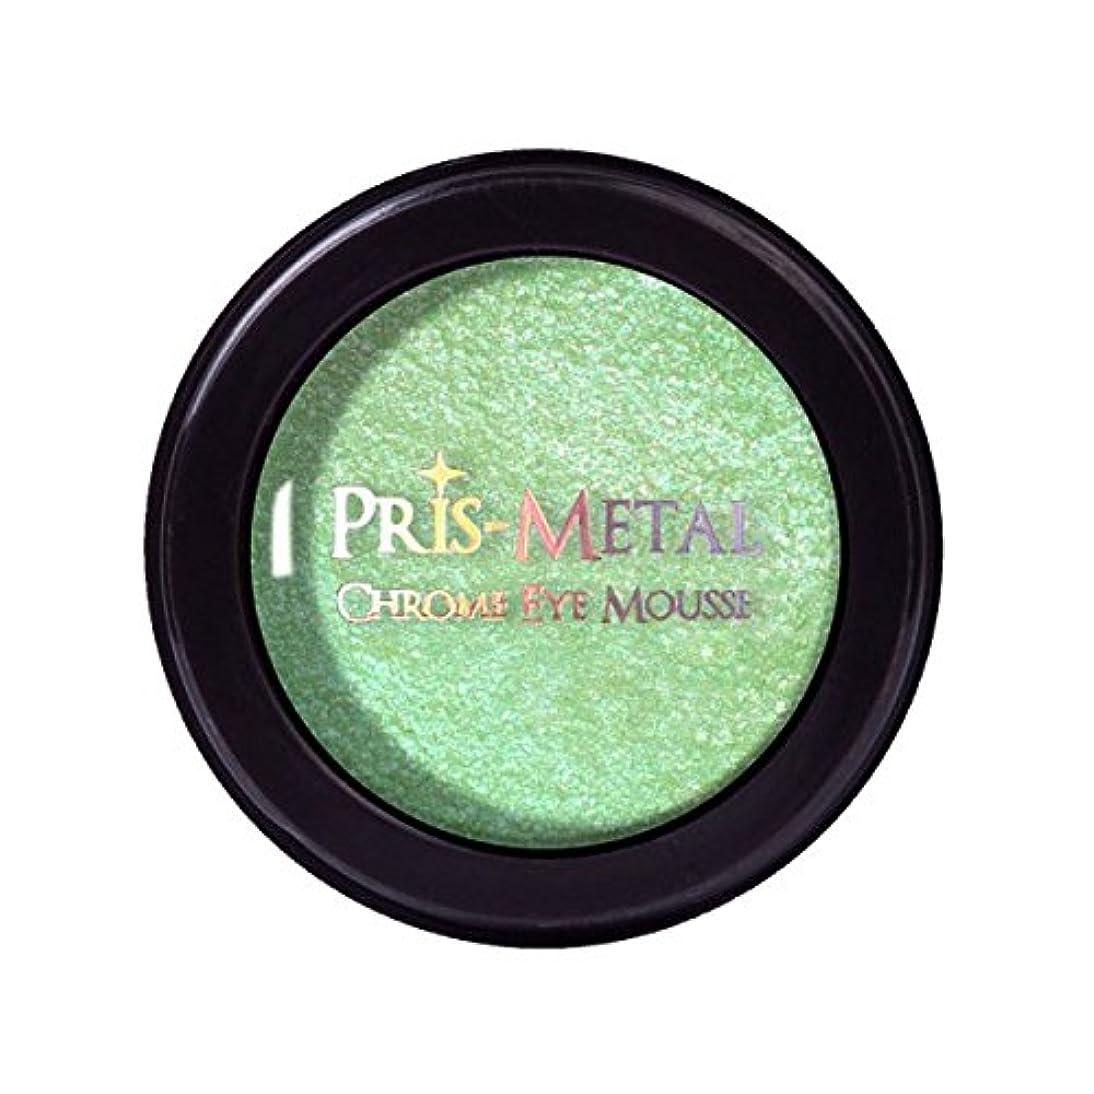 平行大量克服するJ. CAT BEAUTY Pris-Metal Chrome Eye Mousse - Pixie Dust (並行輸入品)